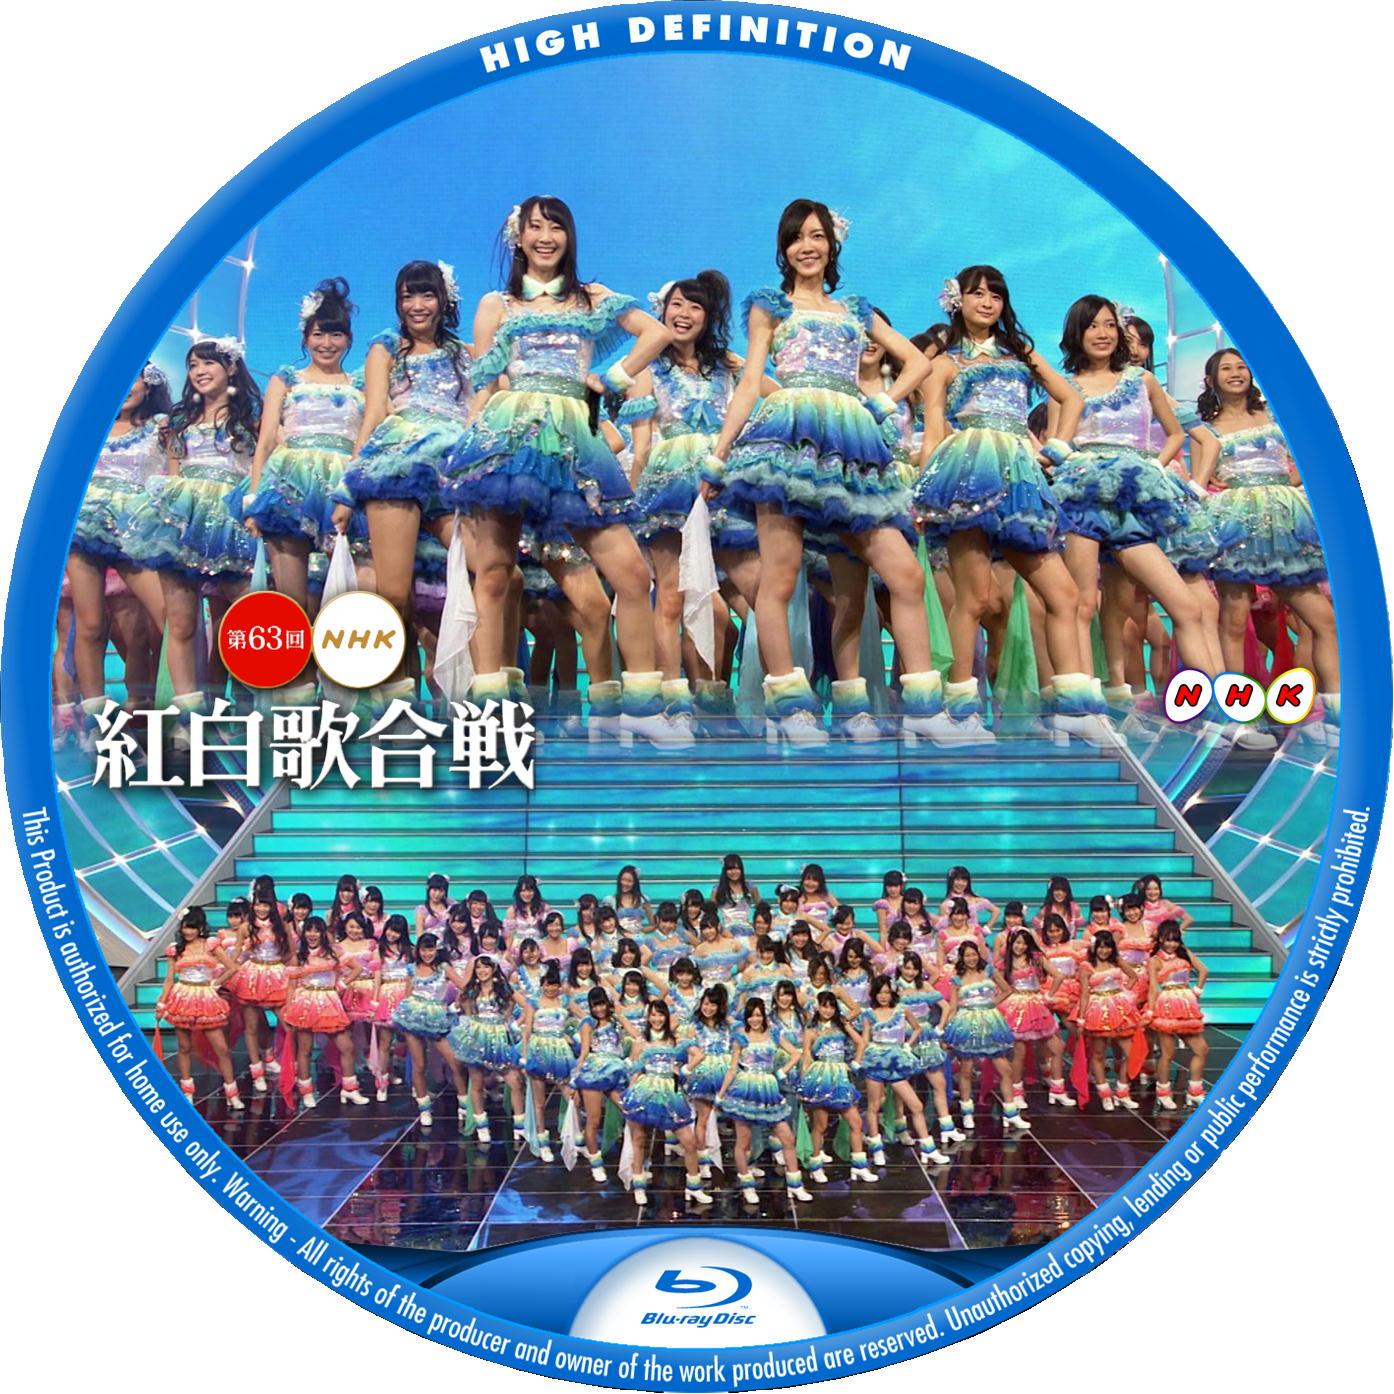 紅白歌合戦 2012 SKE48 BD